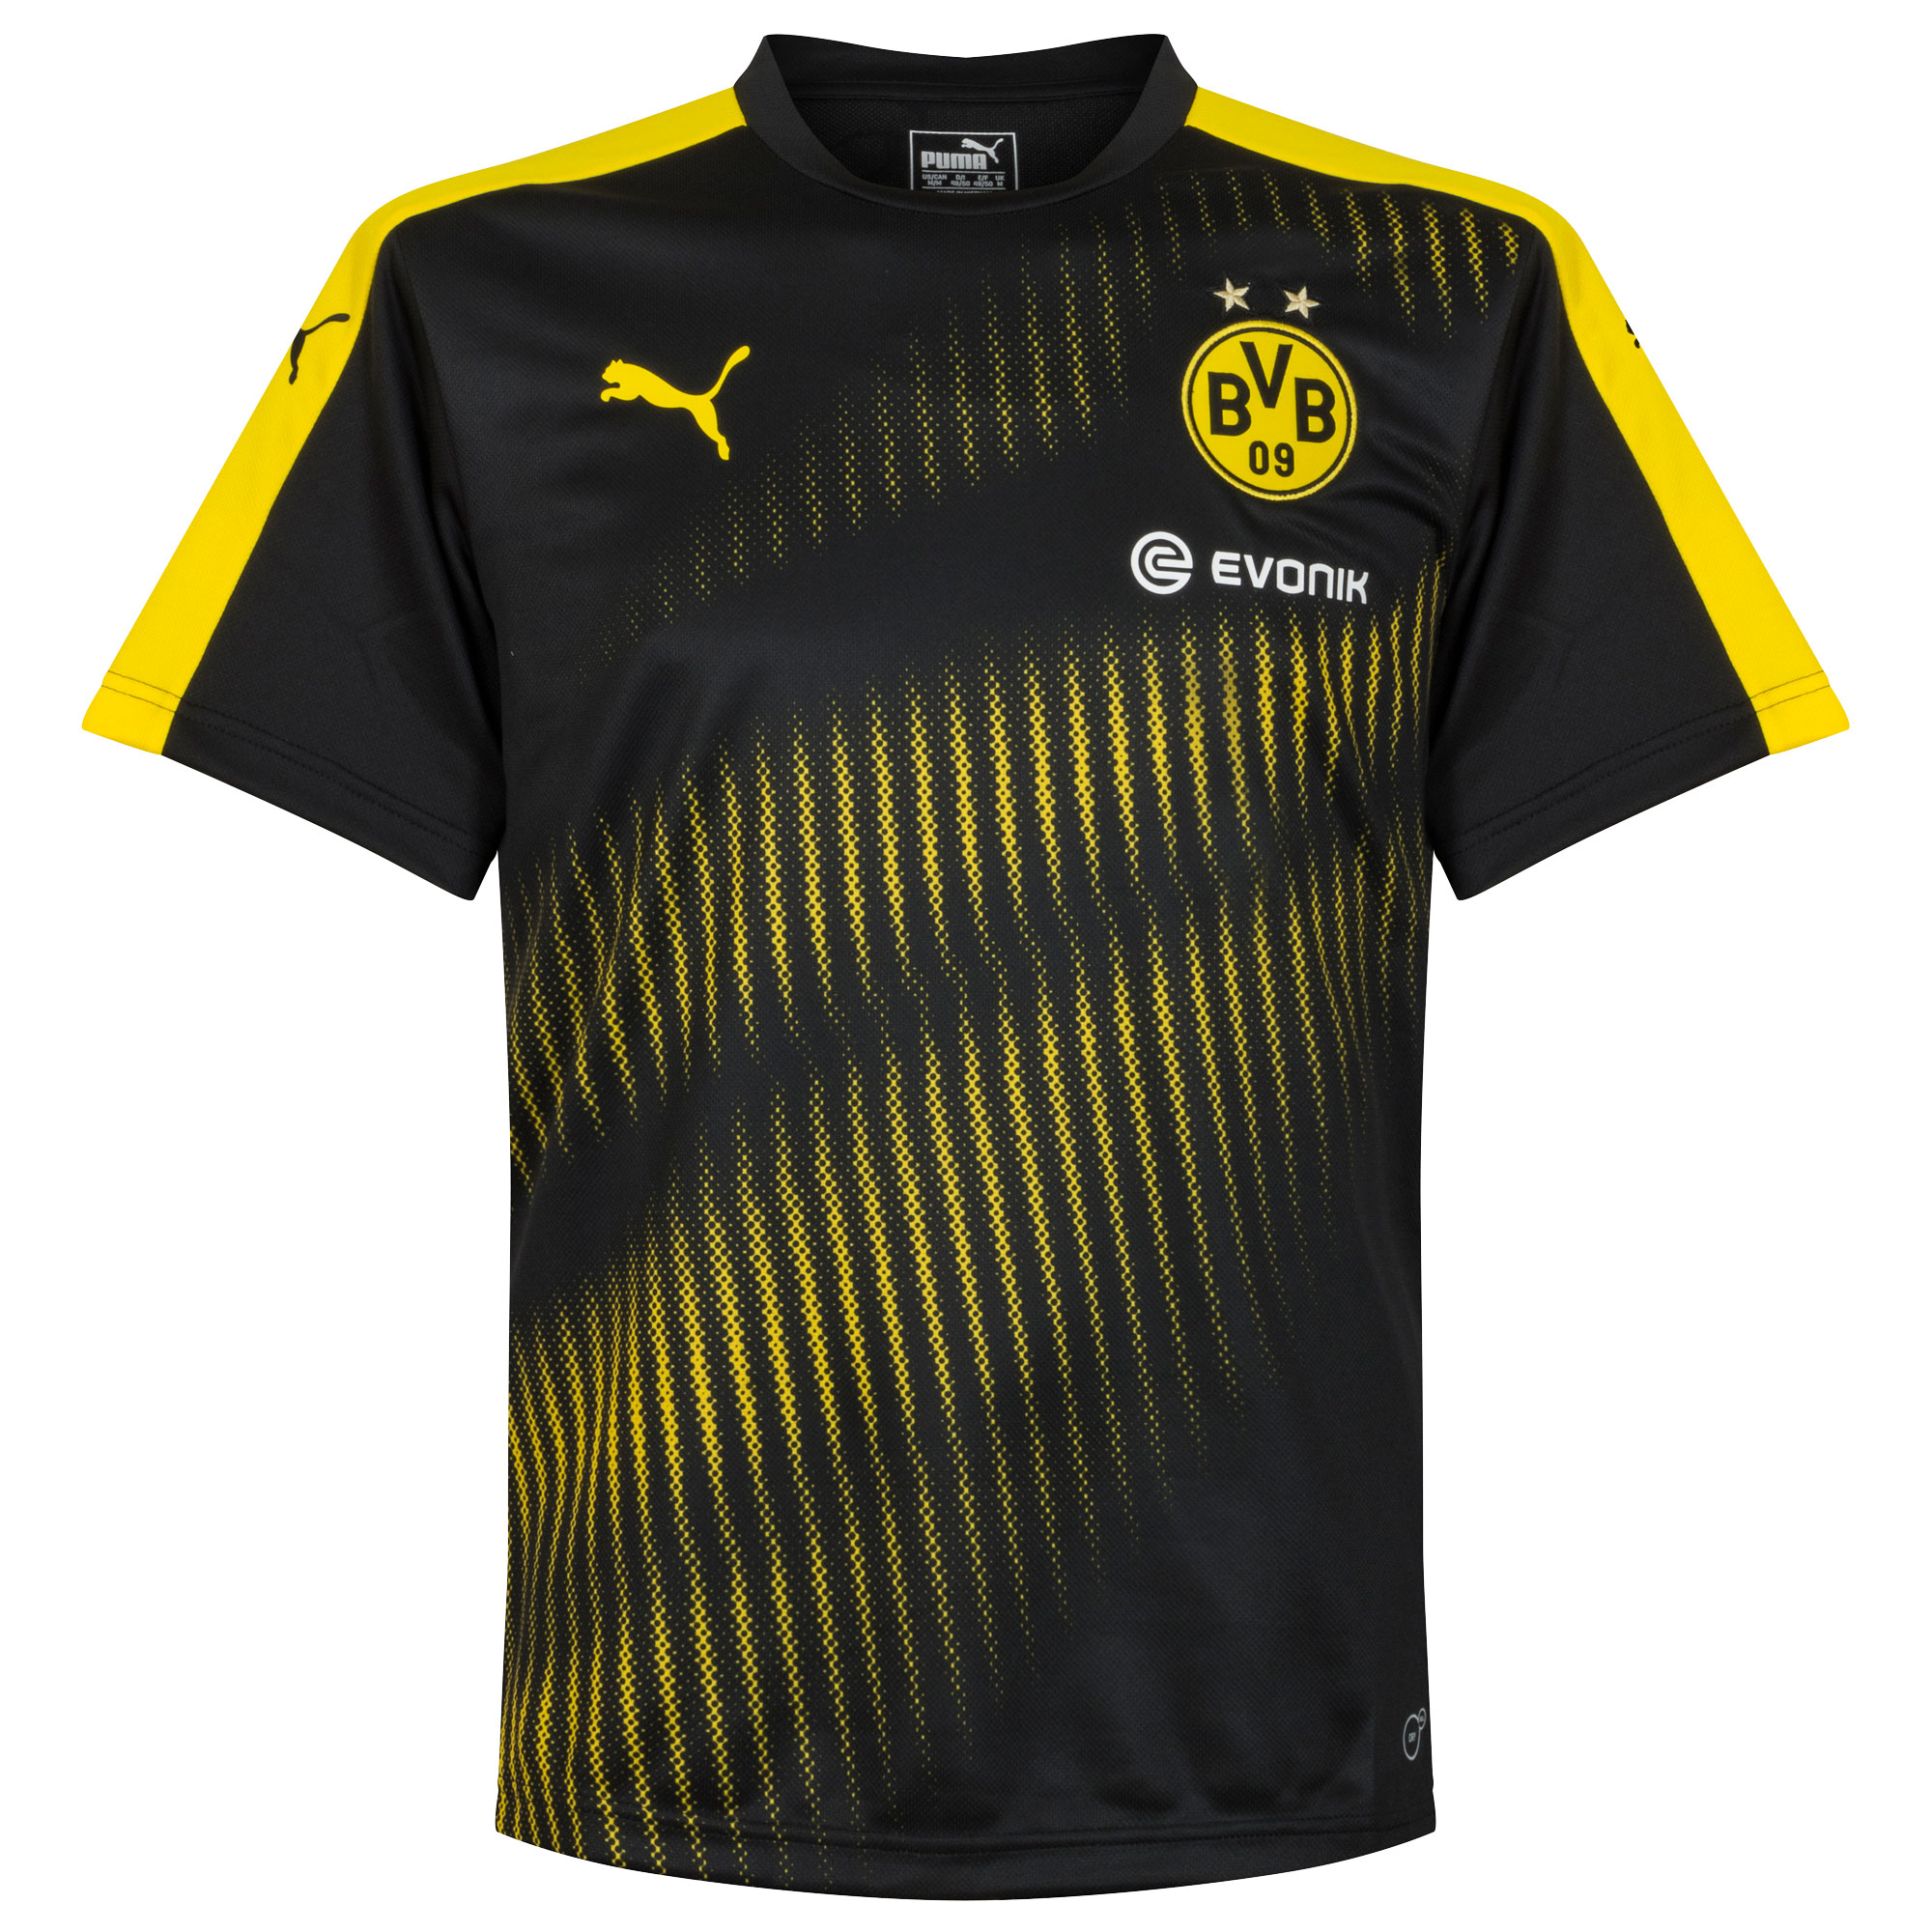 2017 Borussia Dortmund Training Jersey - Black - S